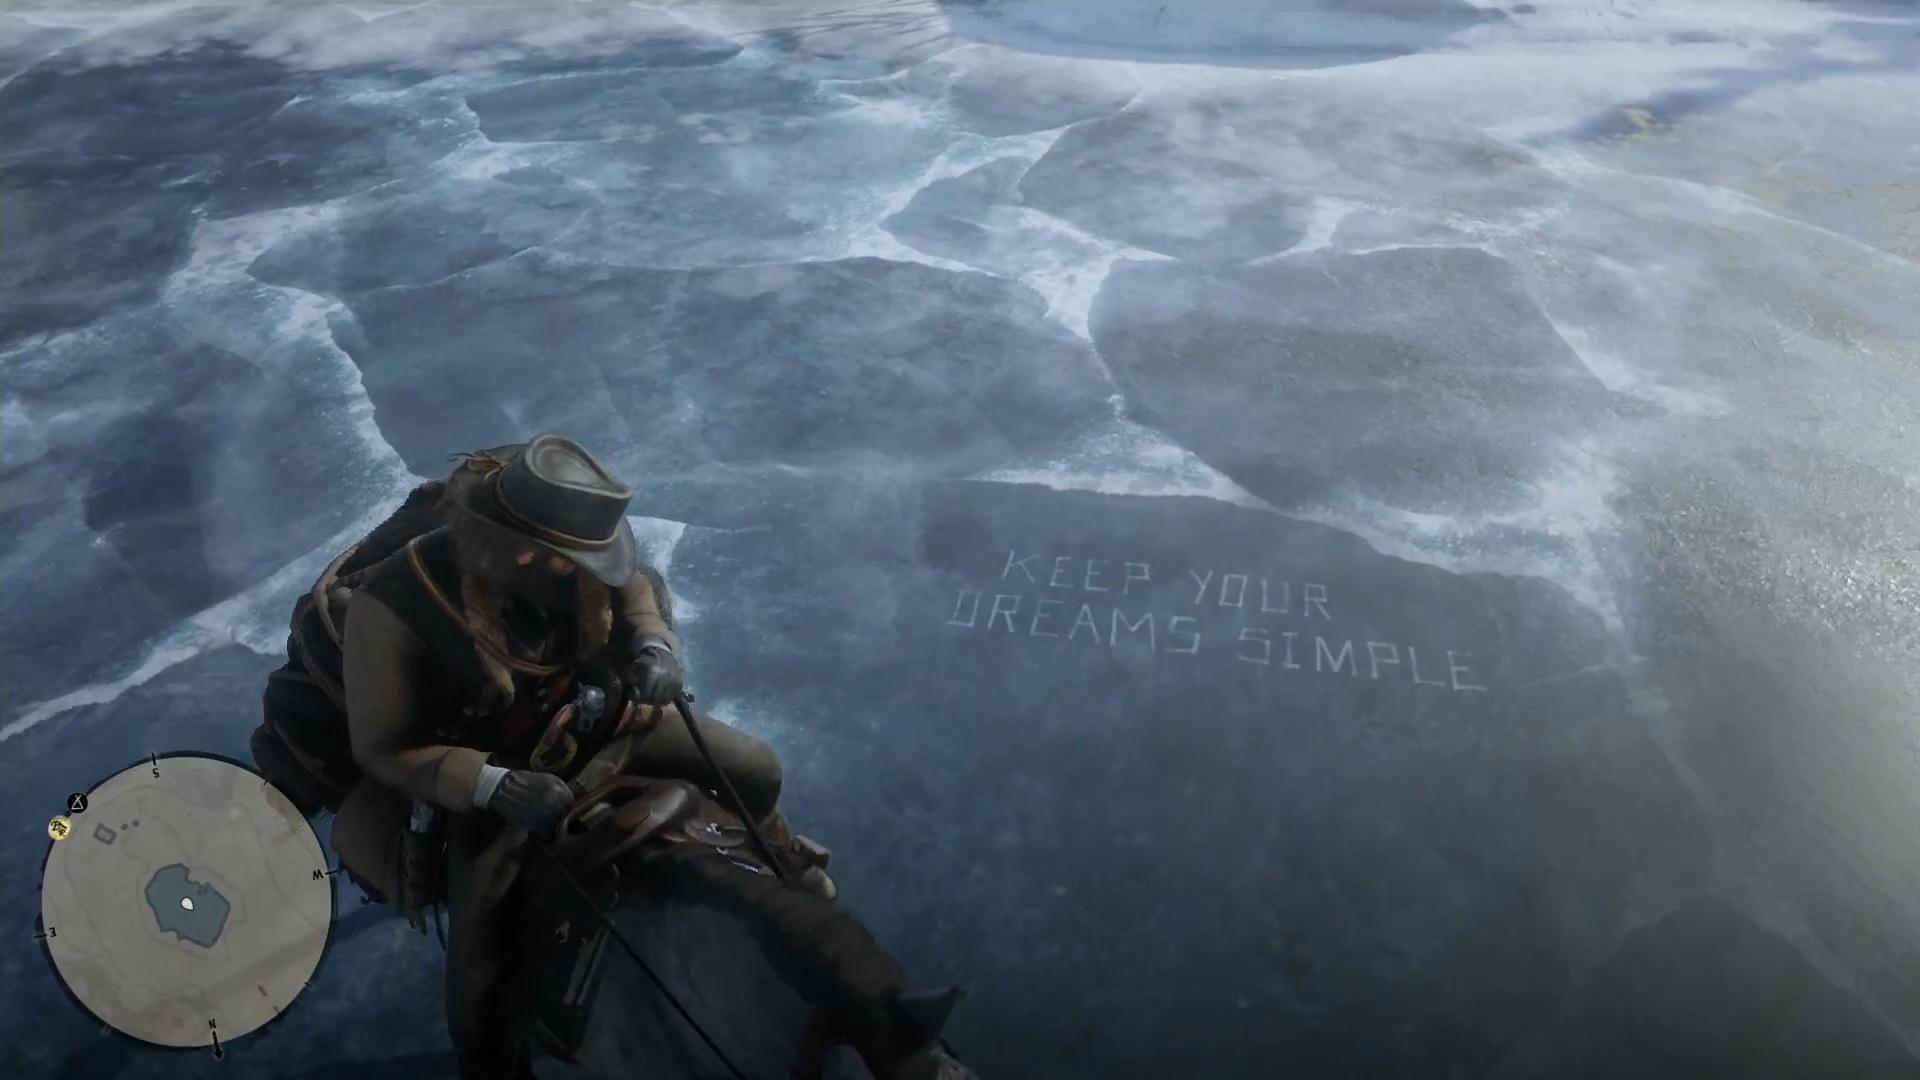 《Red Dead Redemption 2》遊戲作弊碼公開 - 香港手機遊戲網 GameApps.hk